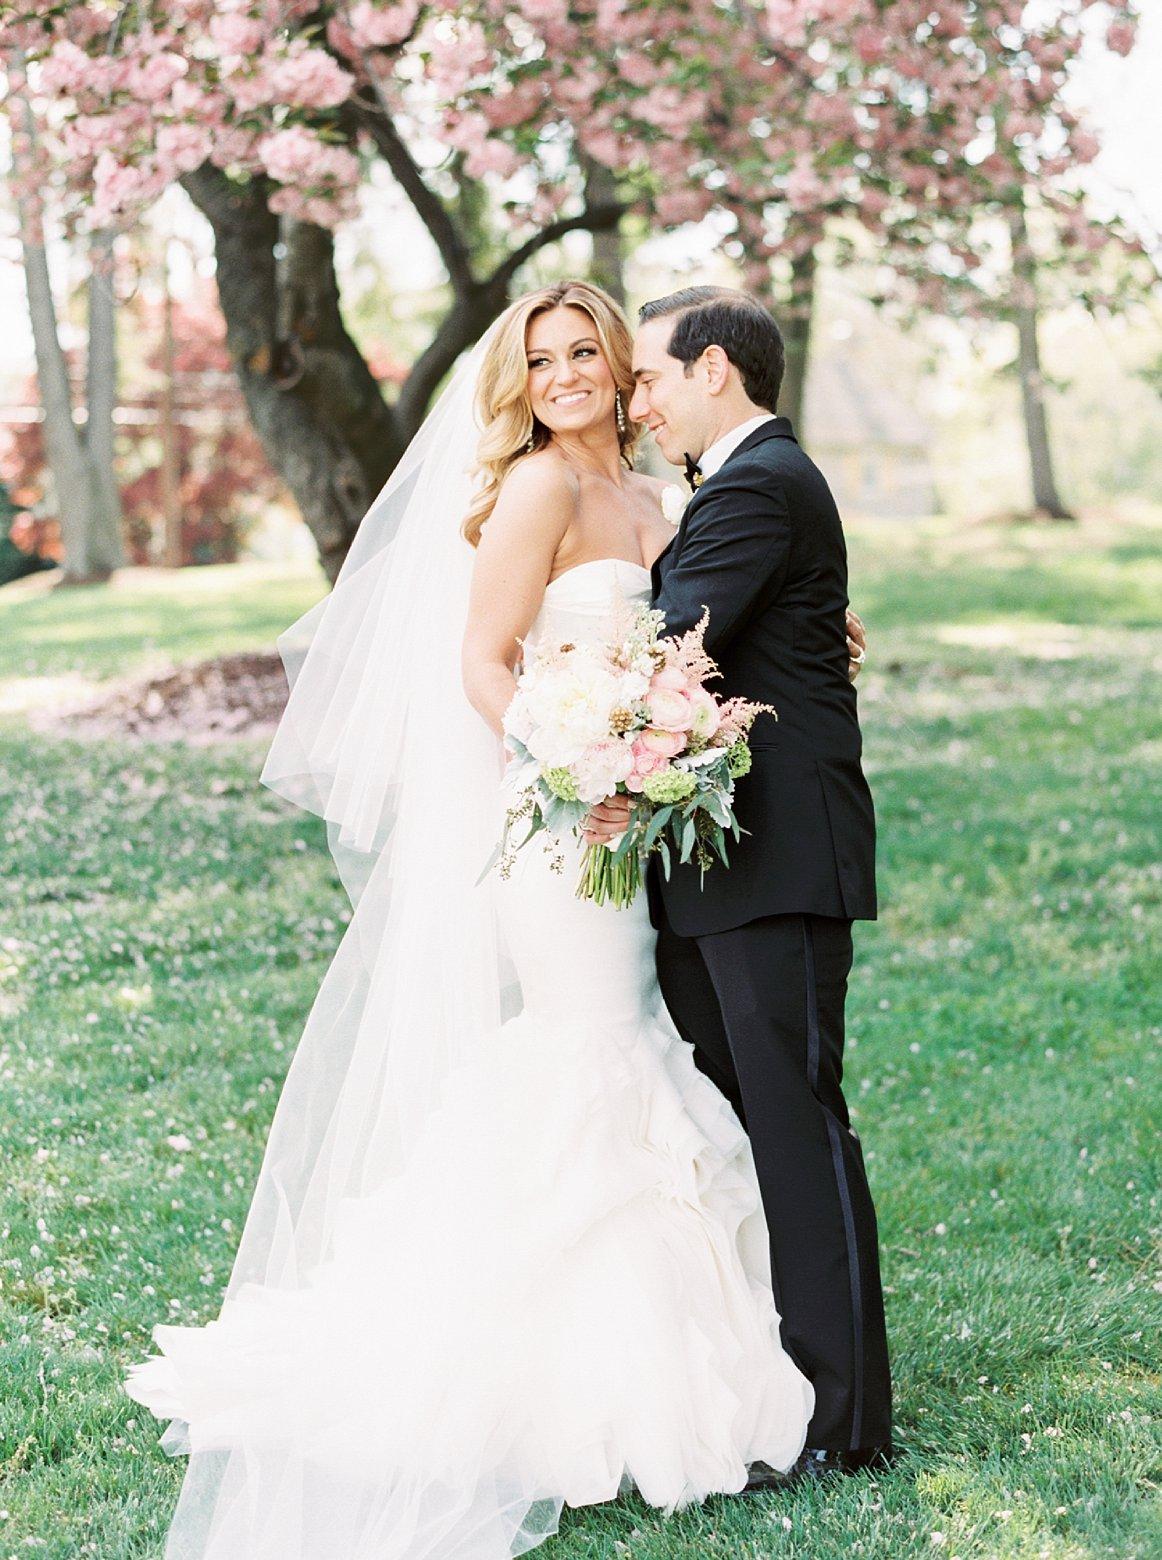 lauren_fair_photography_april_lynn_designs_stasia_matt_spring_cairnwood_estate_wedding_northeast_philadelphia_blush_pink_gold_wedding_invitation_stationery_0075